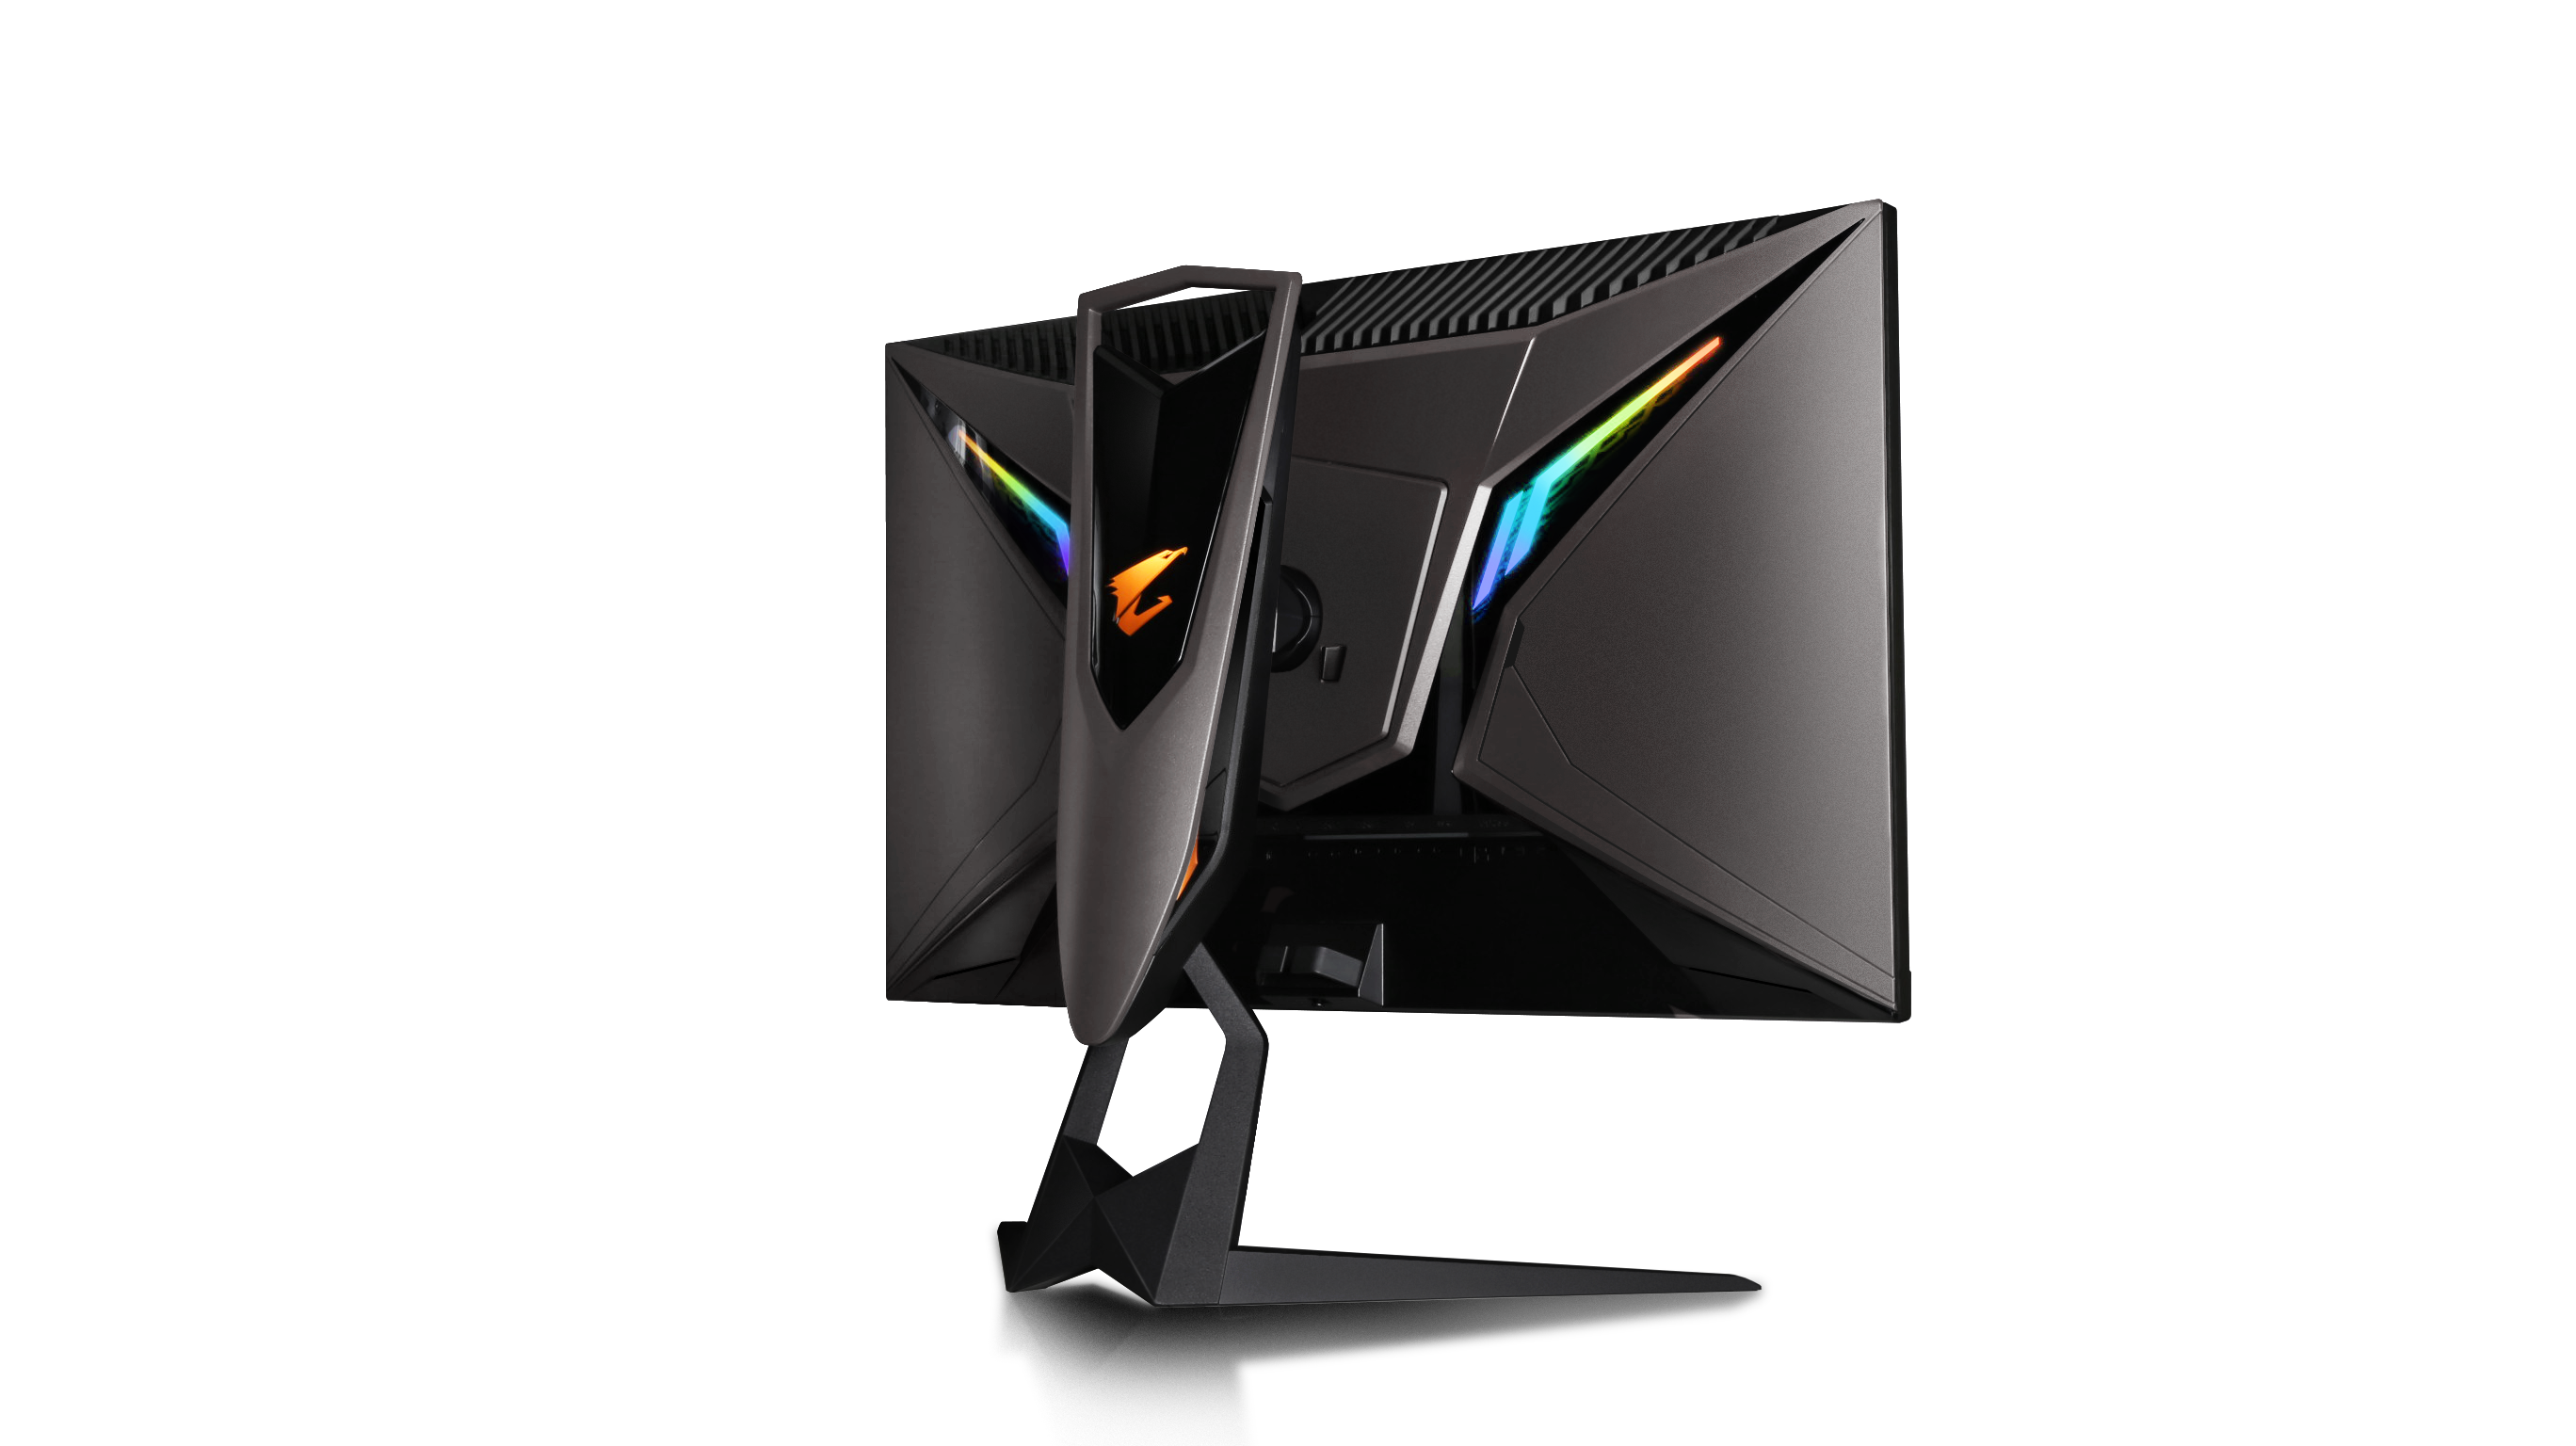 World's First Tactical Gaming Monitor AORUS AD27QD Announced!   News